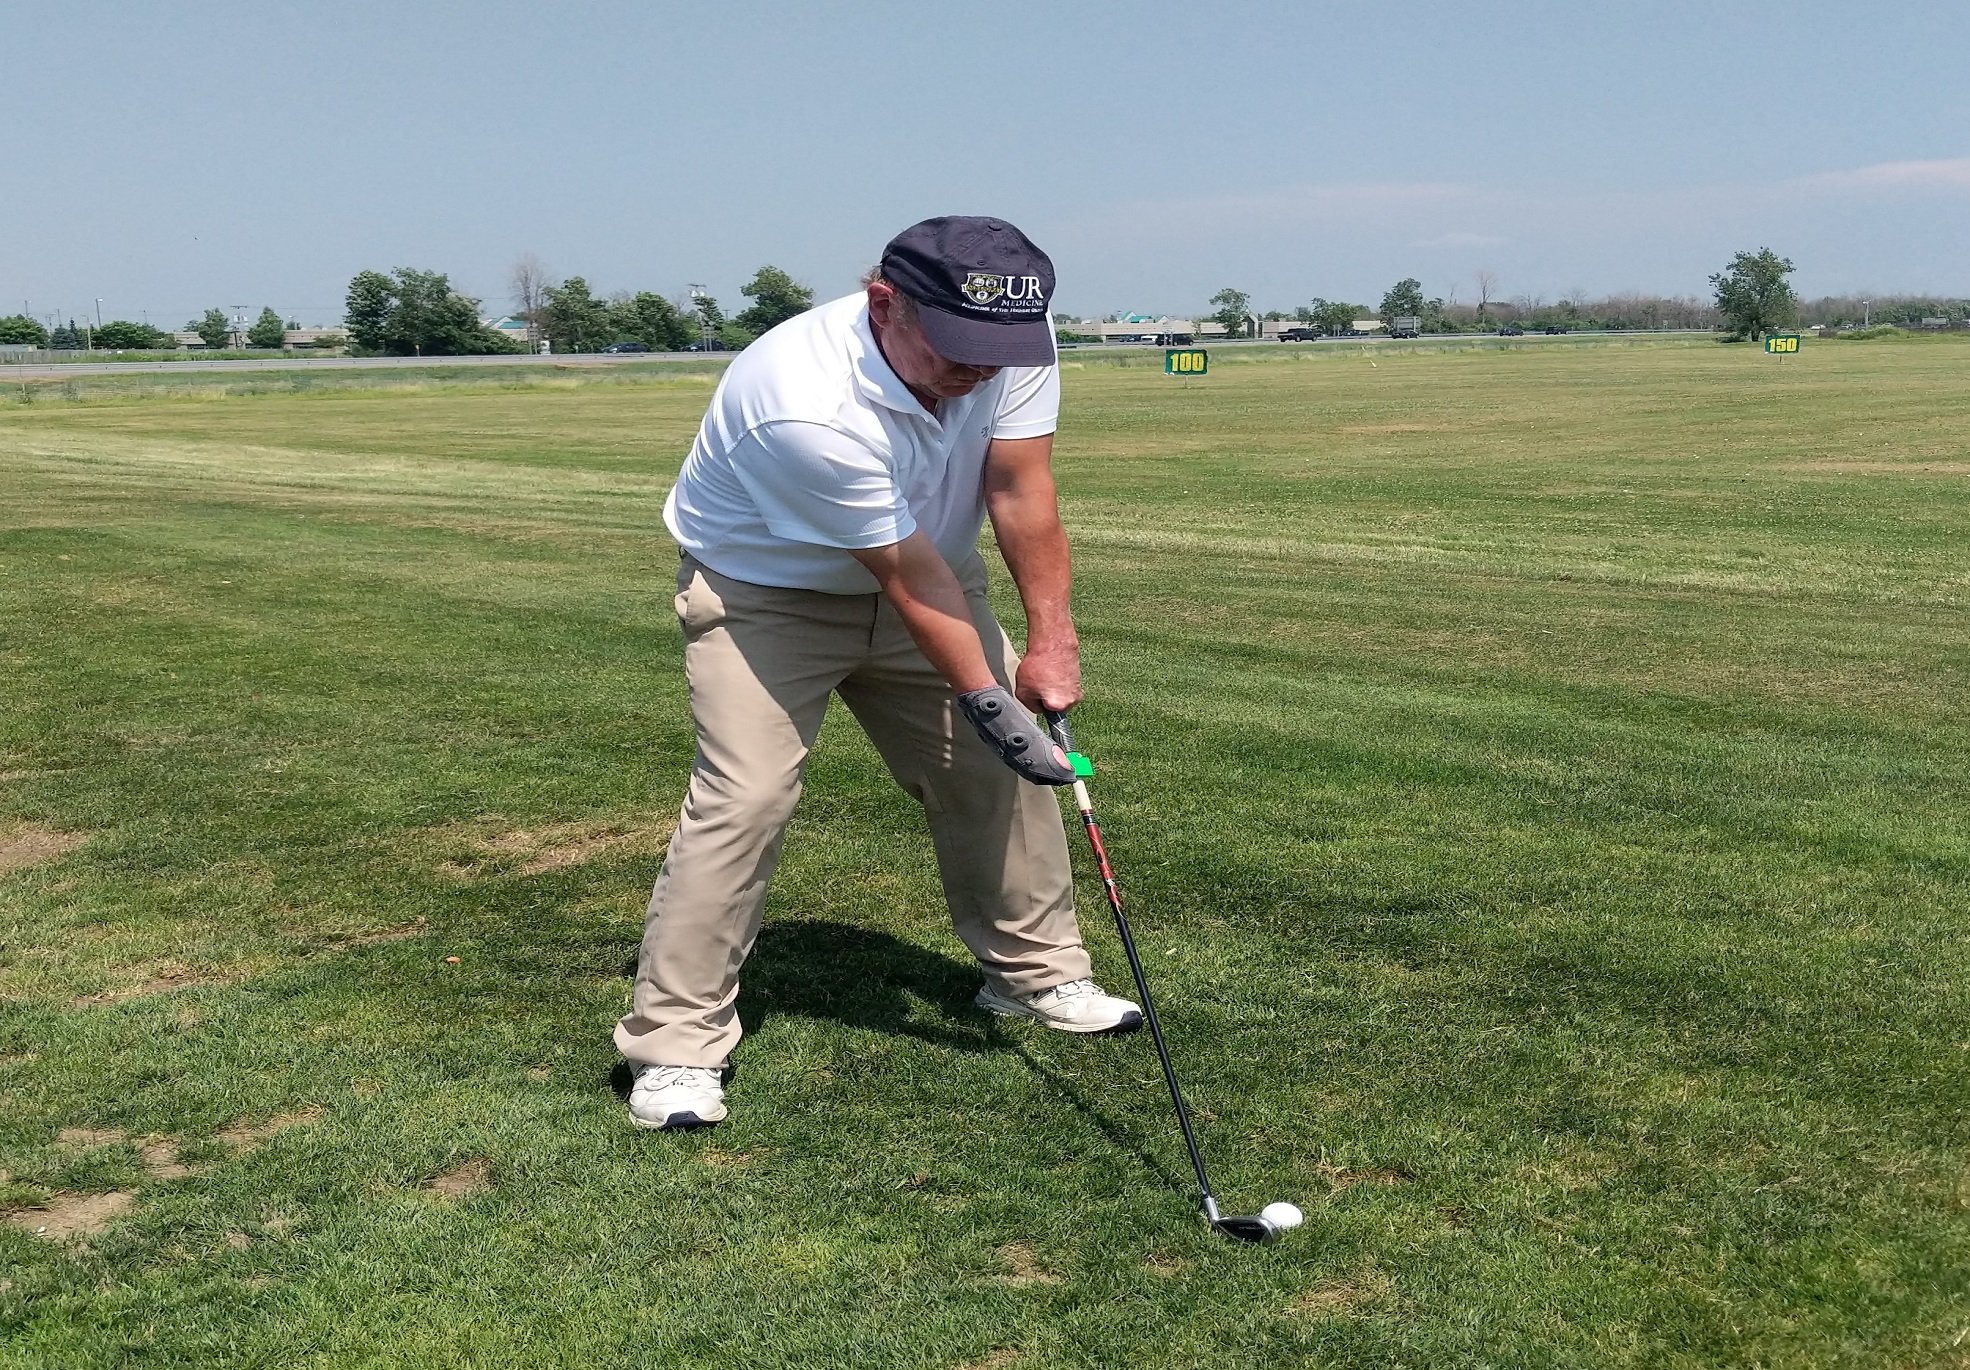 Golfer Gary 2.0